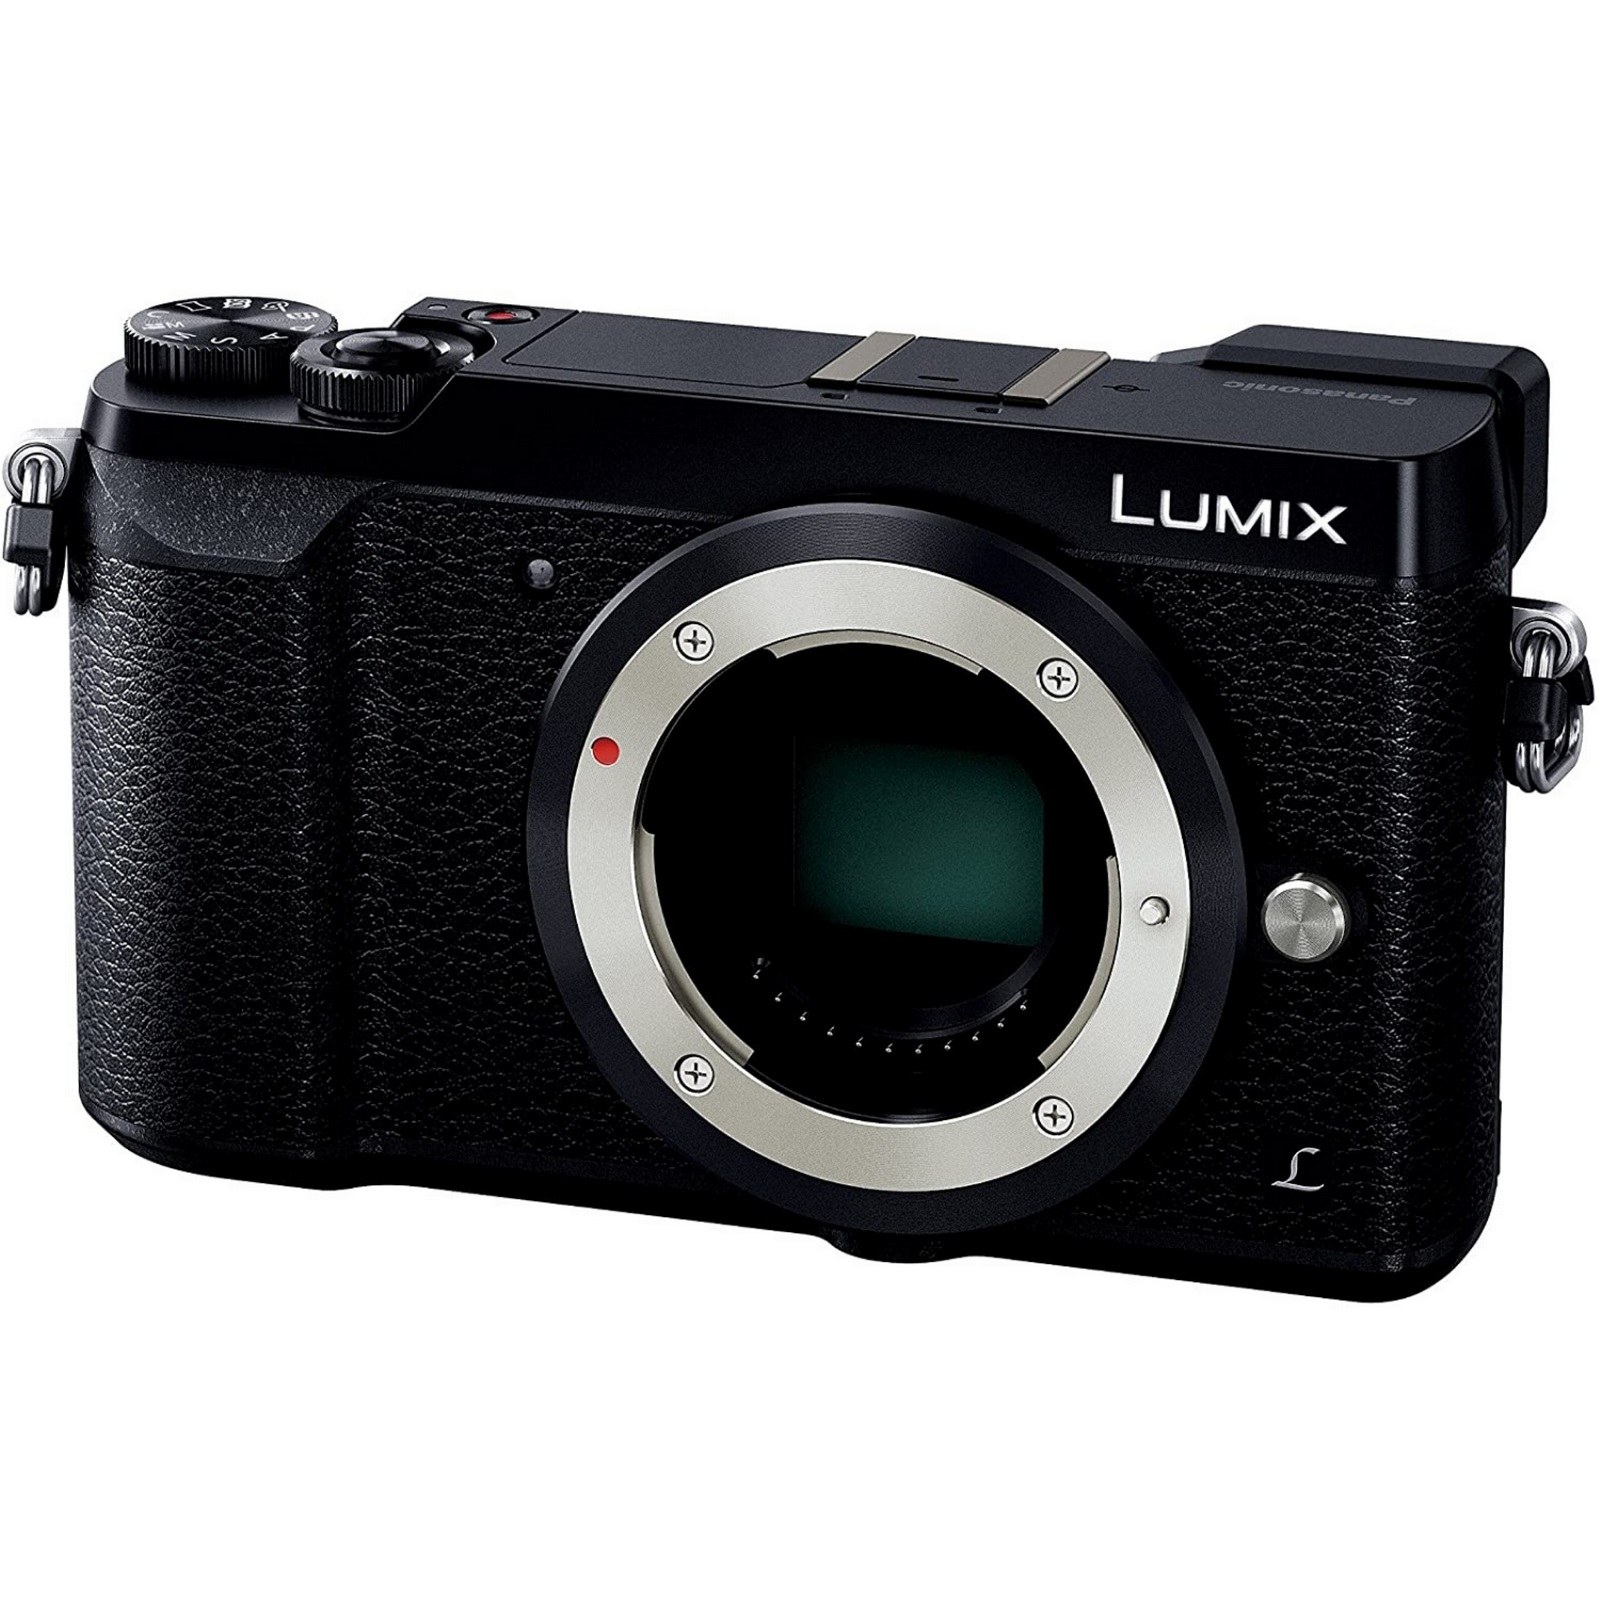 Panasonic パナソニック ミラーレス一眼カメラ ルミックス GX7 MarkII ボディ ブラック DMC-GX7MK2 新品